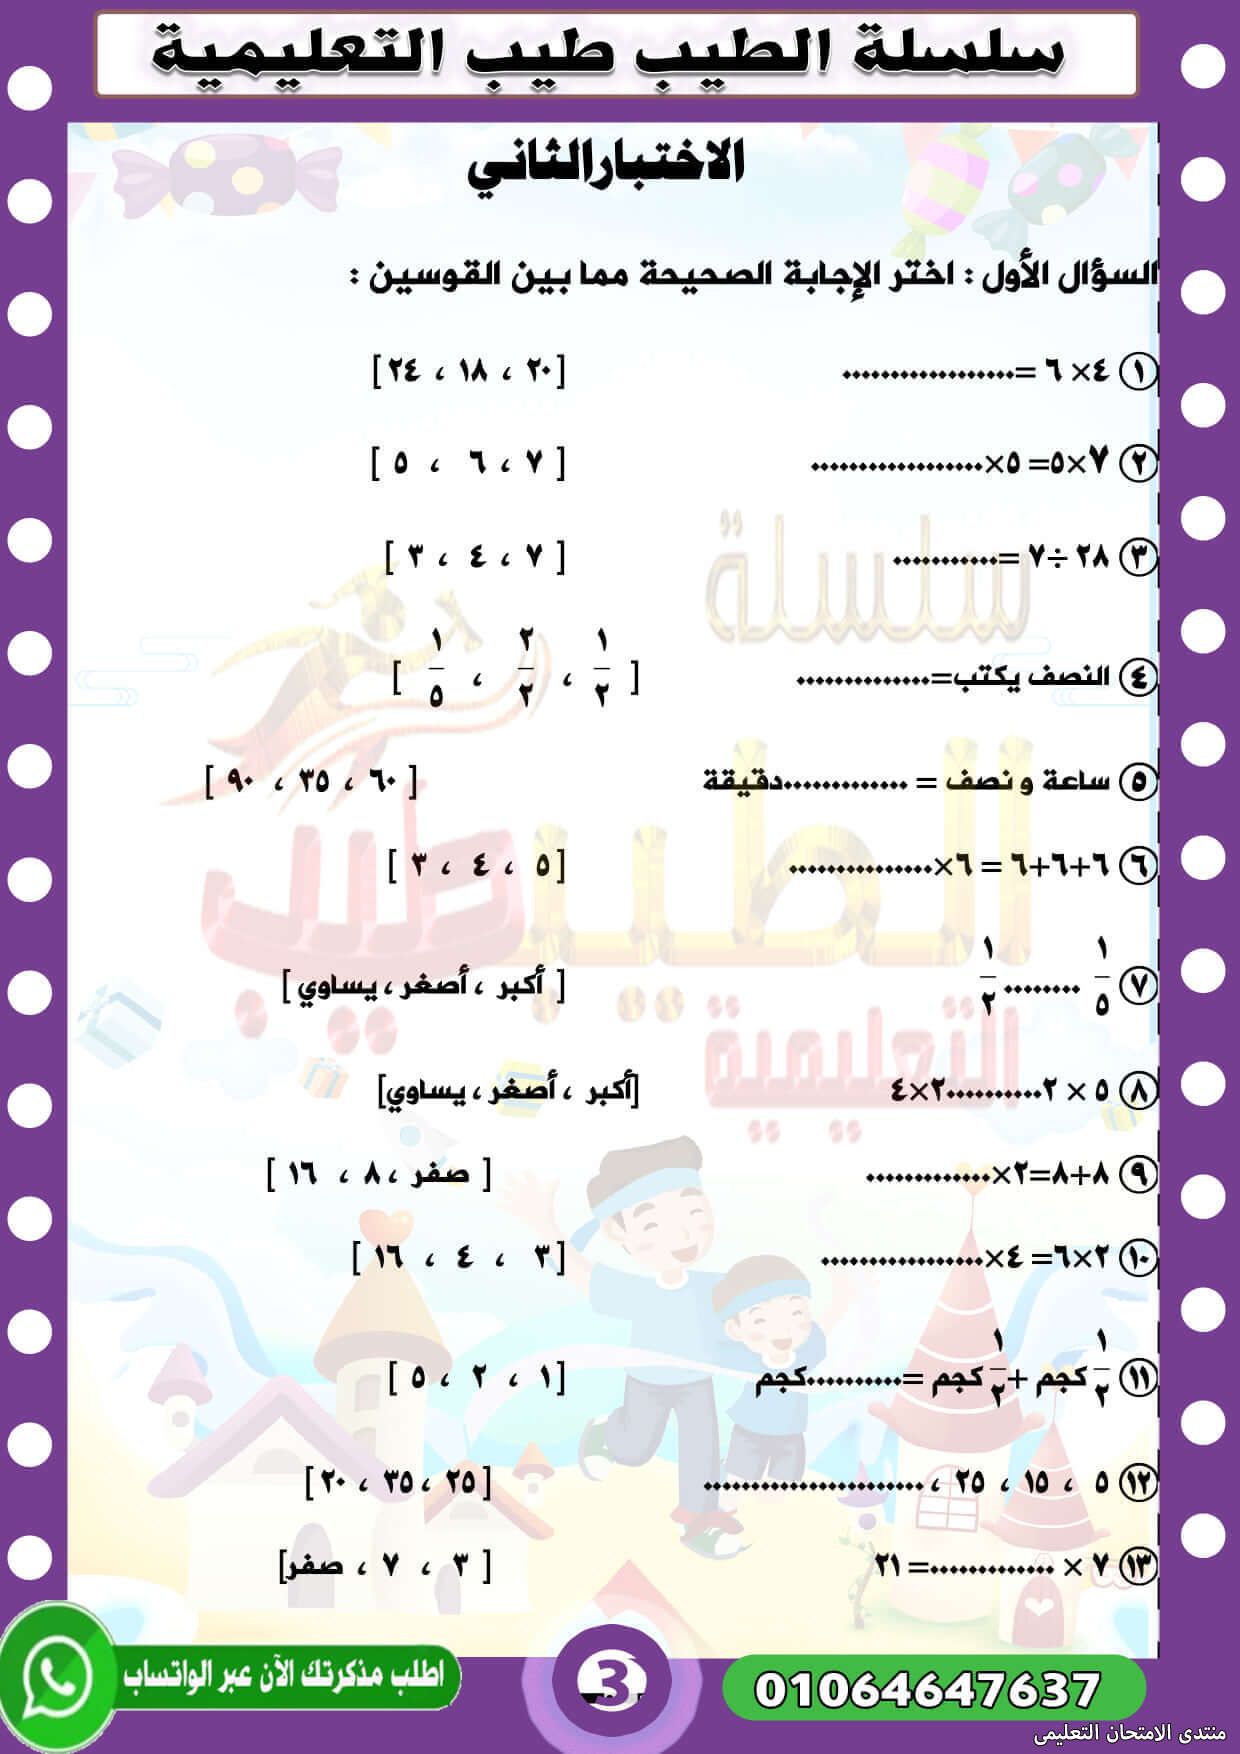 exam-eg.com_16183569179273.jpg